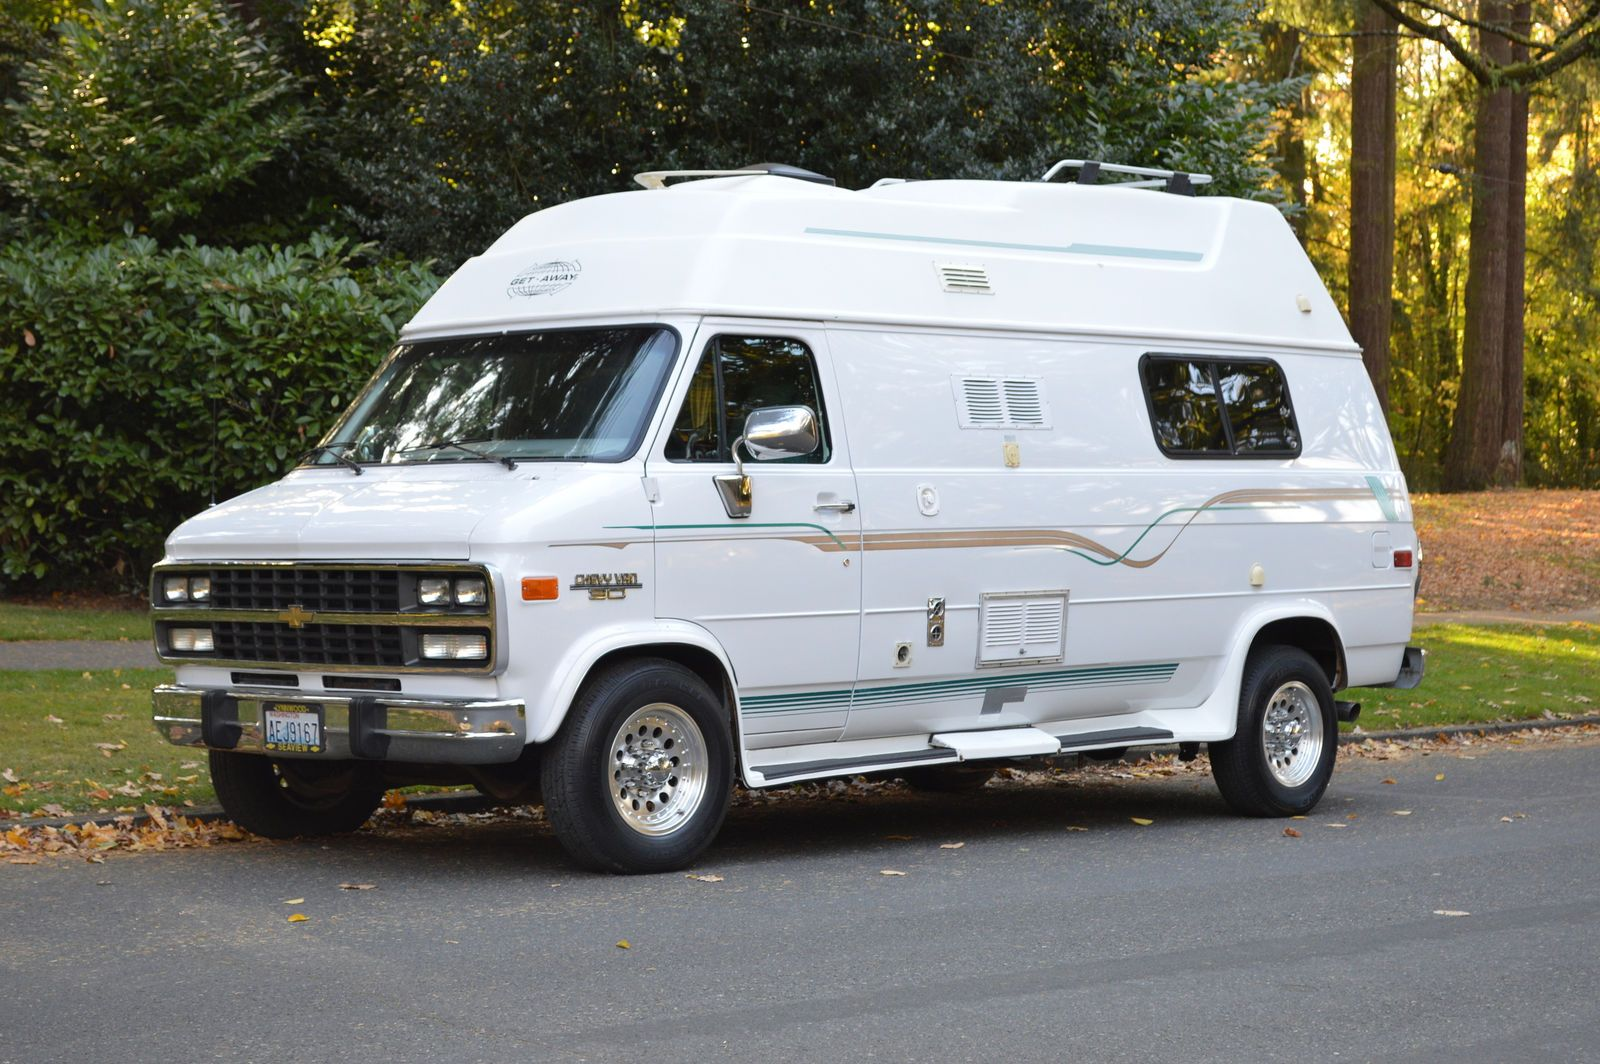 Low Miles 1996 Chevy Get Away Van Camper Gmc Vans Campers For Sale Chevy